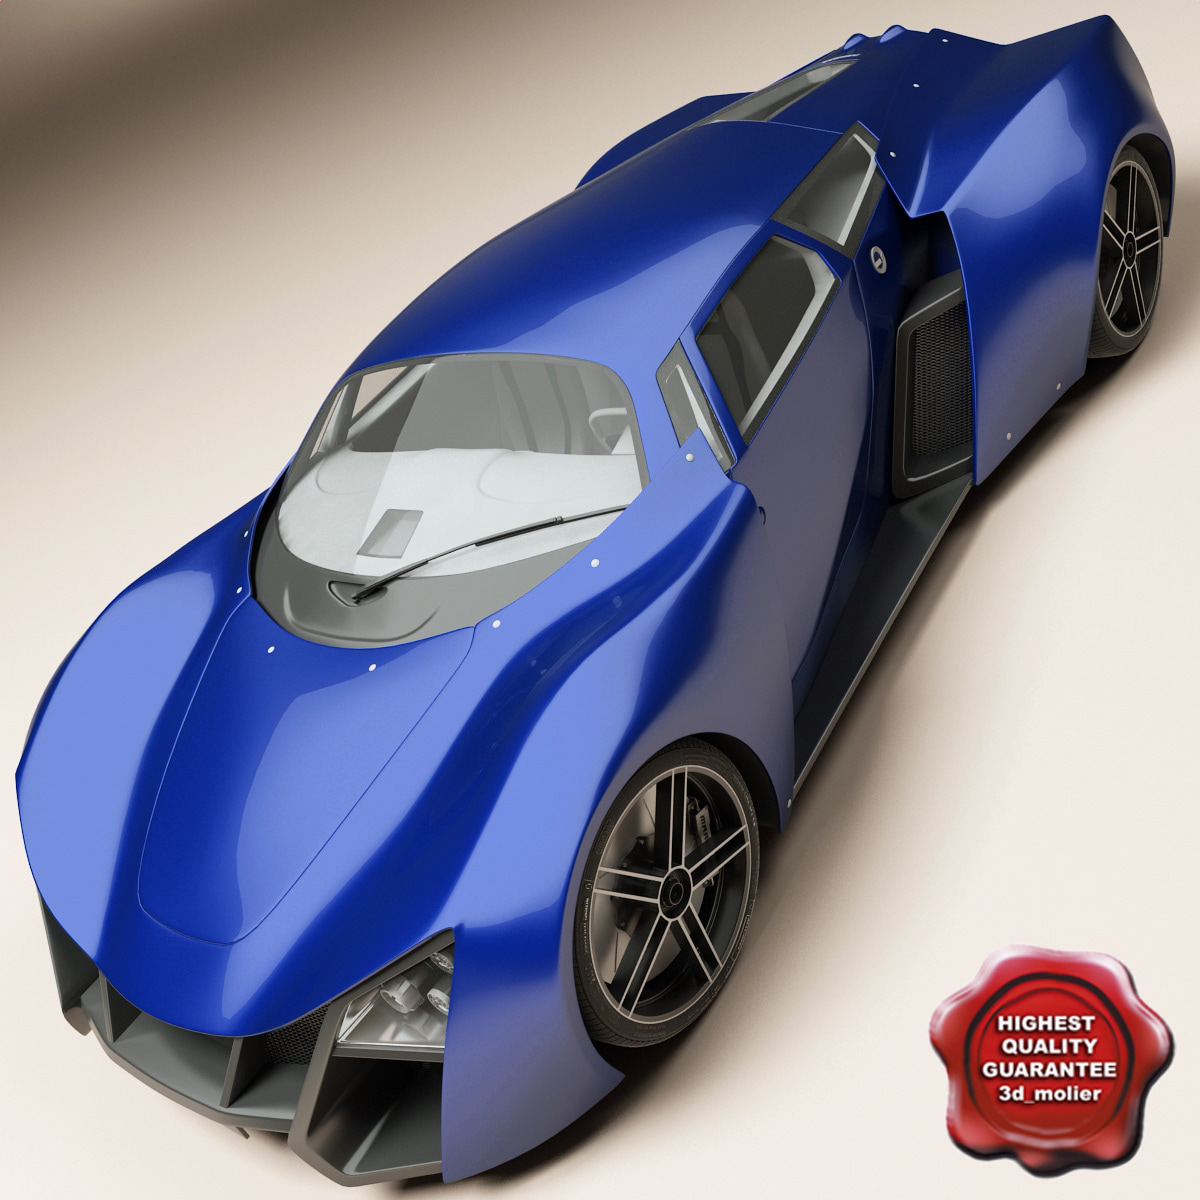 Marussia_B2_Super_Car_00.jpg